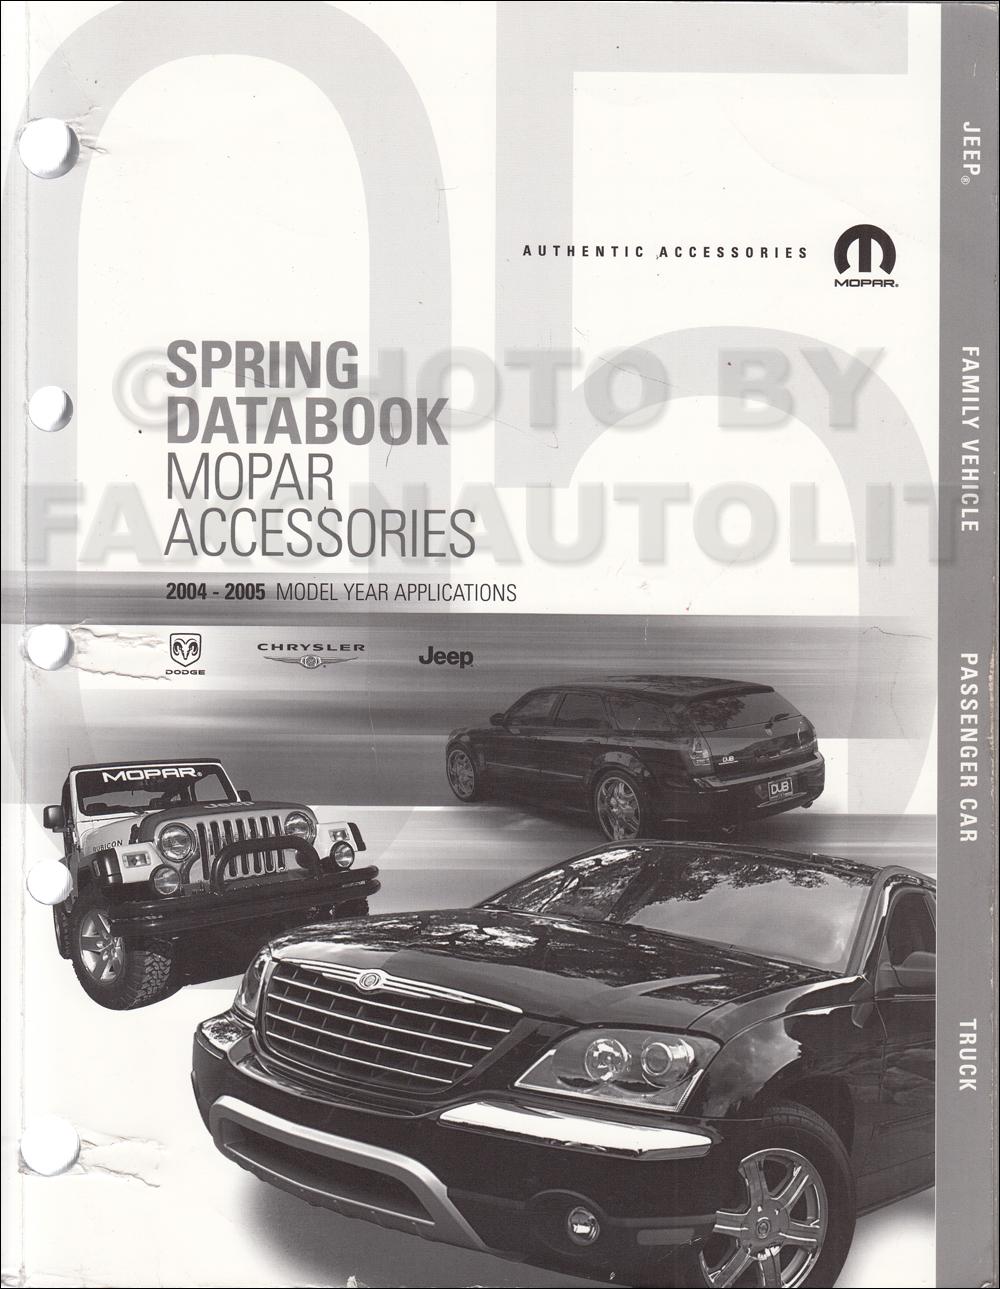 2004-2005 MoPar Accessories Databook Original Spring